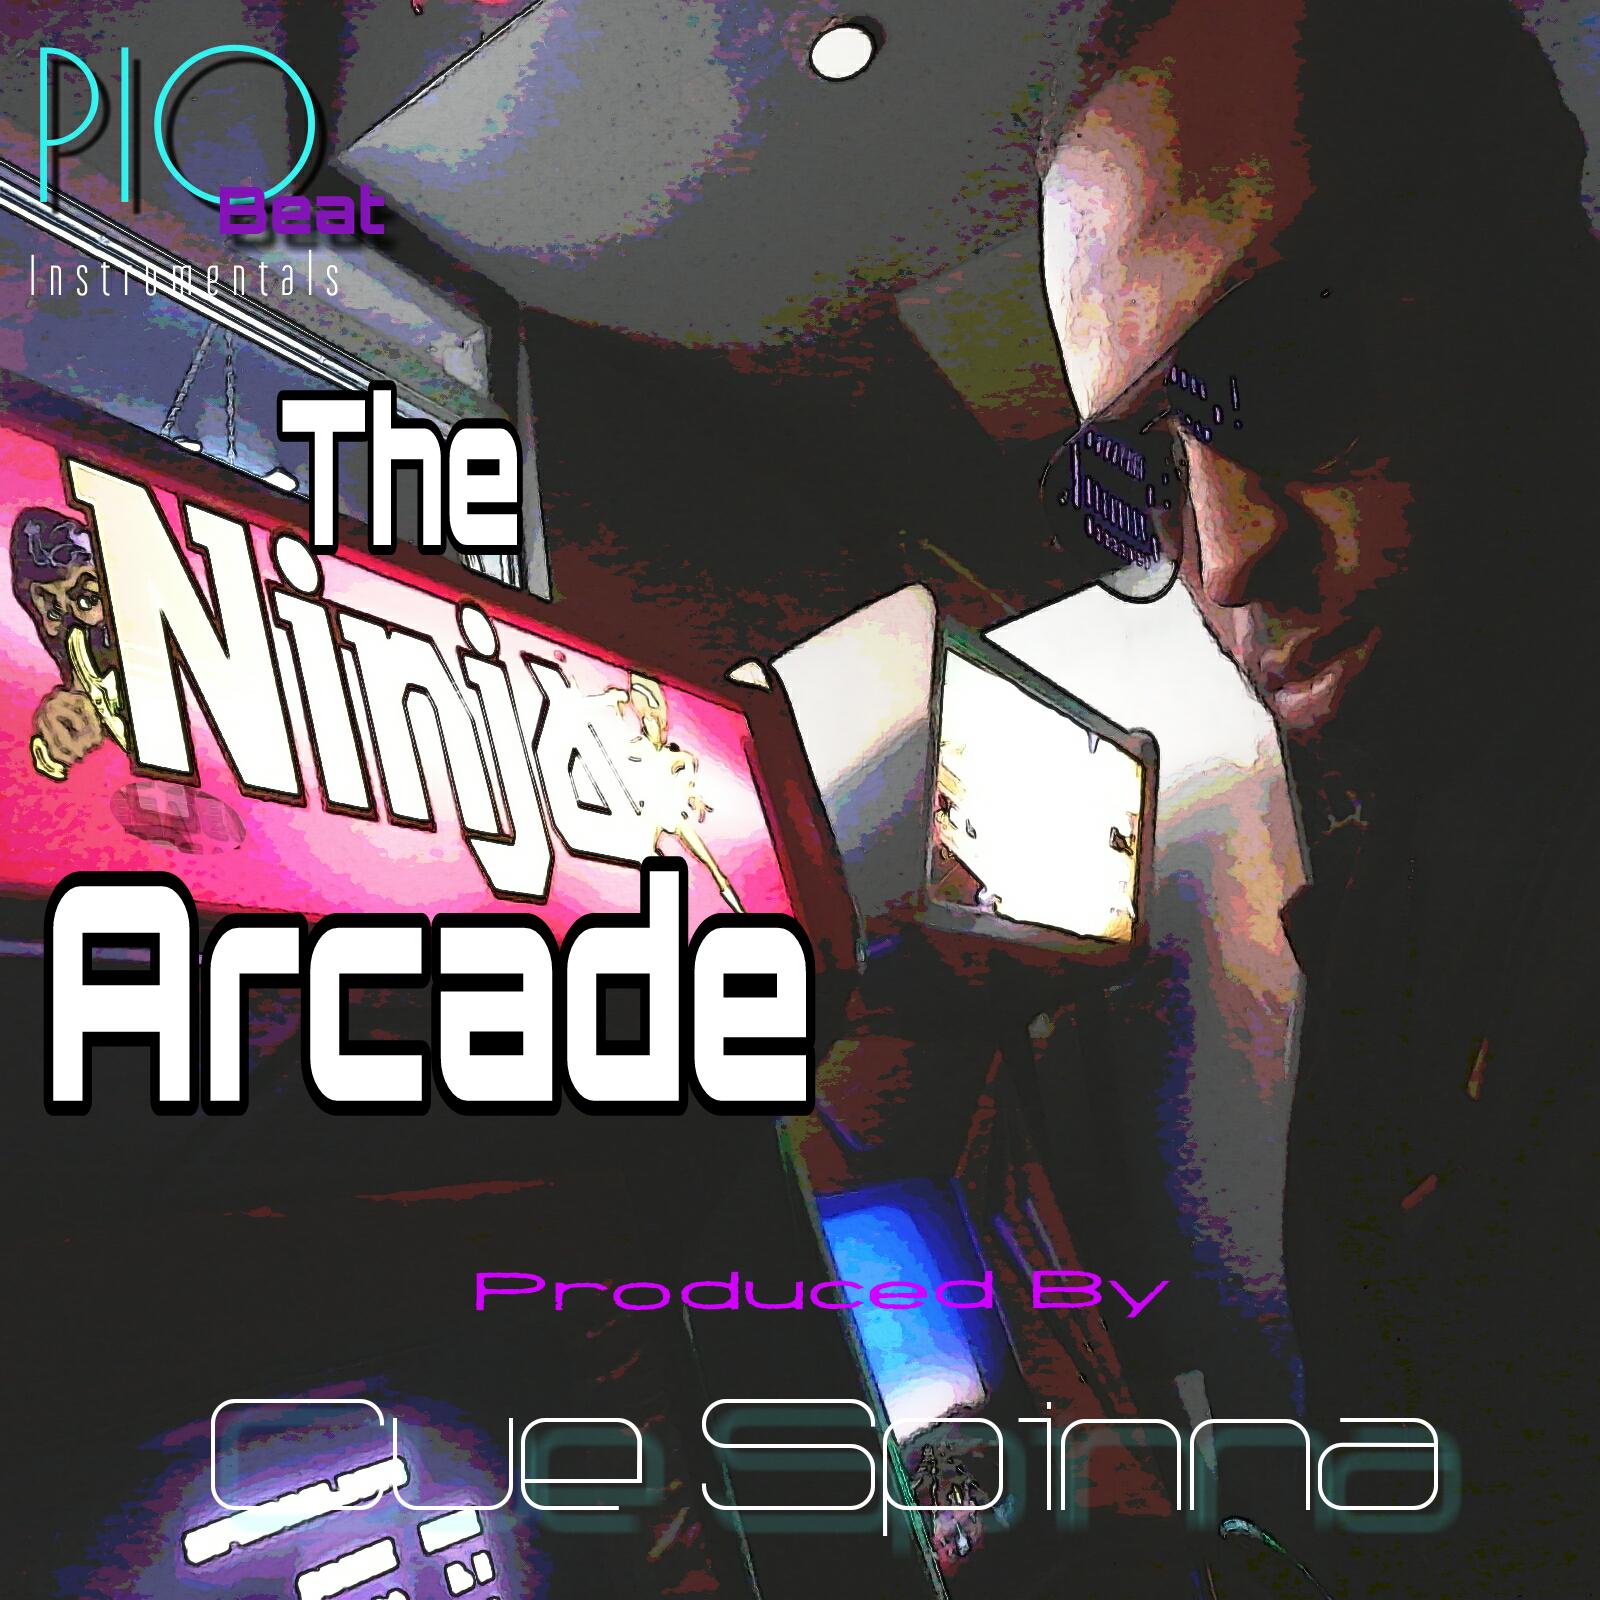 'The Ninja Arcade' Instrumental LP